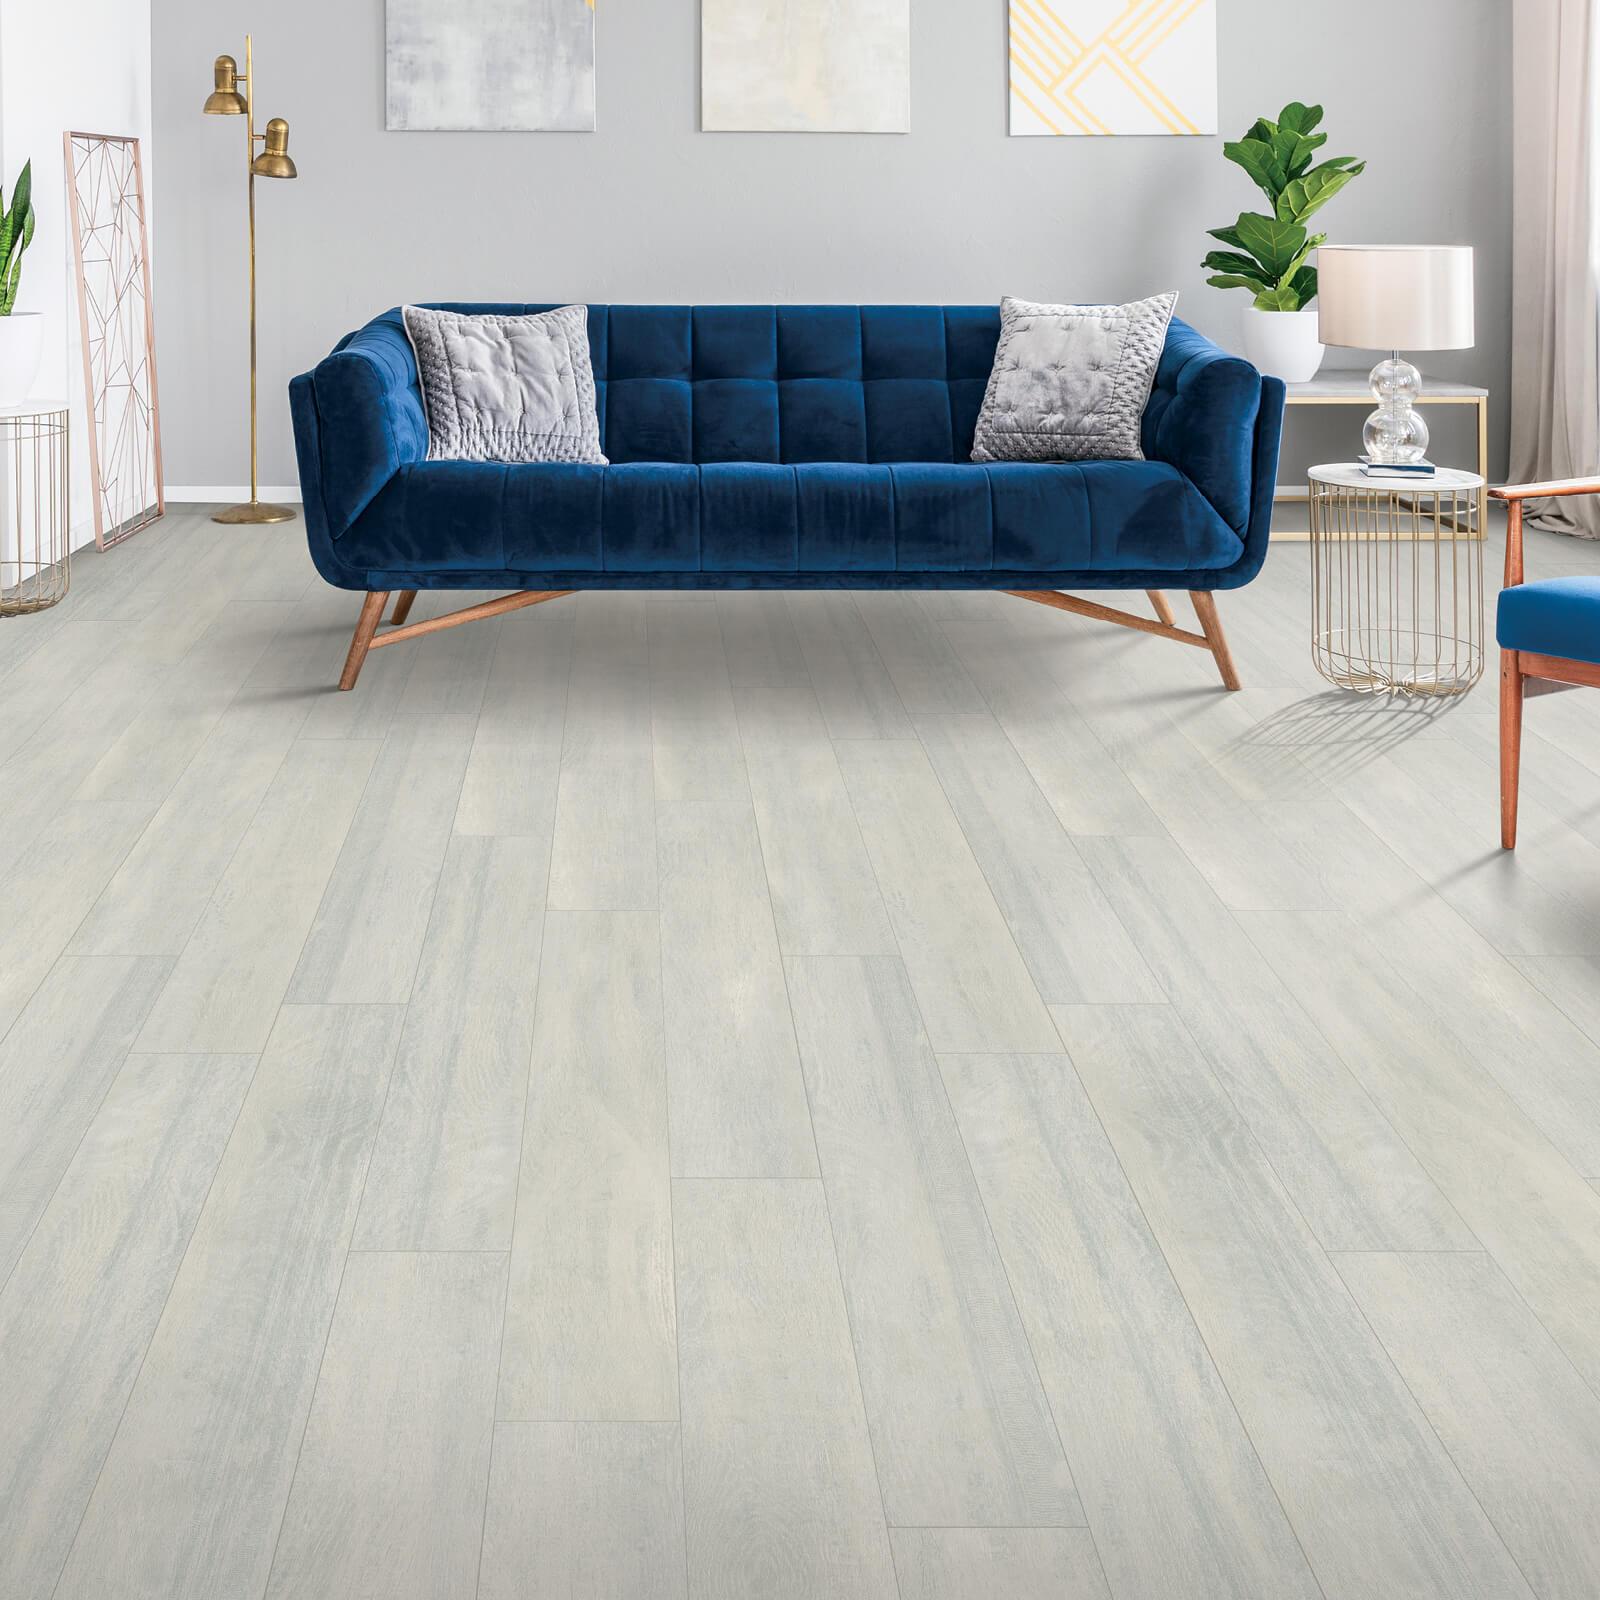 Cushions | Hamernick's Interior Solutions